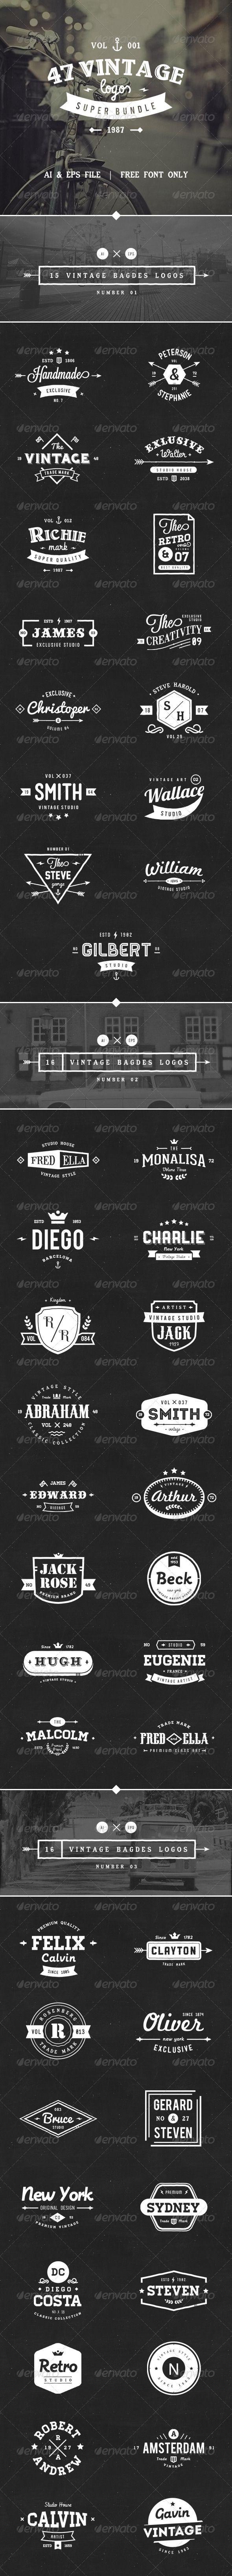 47 Vintage Logos Bundle Template | Buy and Download: http://graphicriver.net/item/47-vintage-logos-bundle/8411488?ref=ksioks: